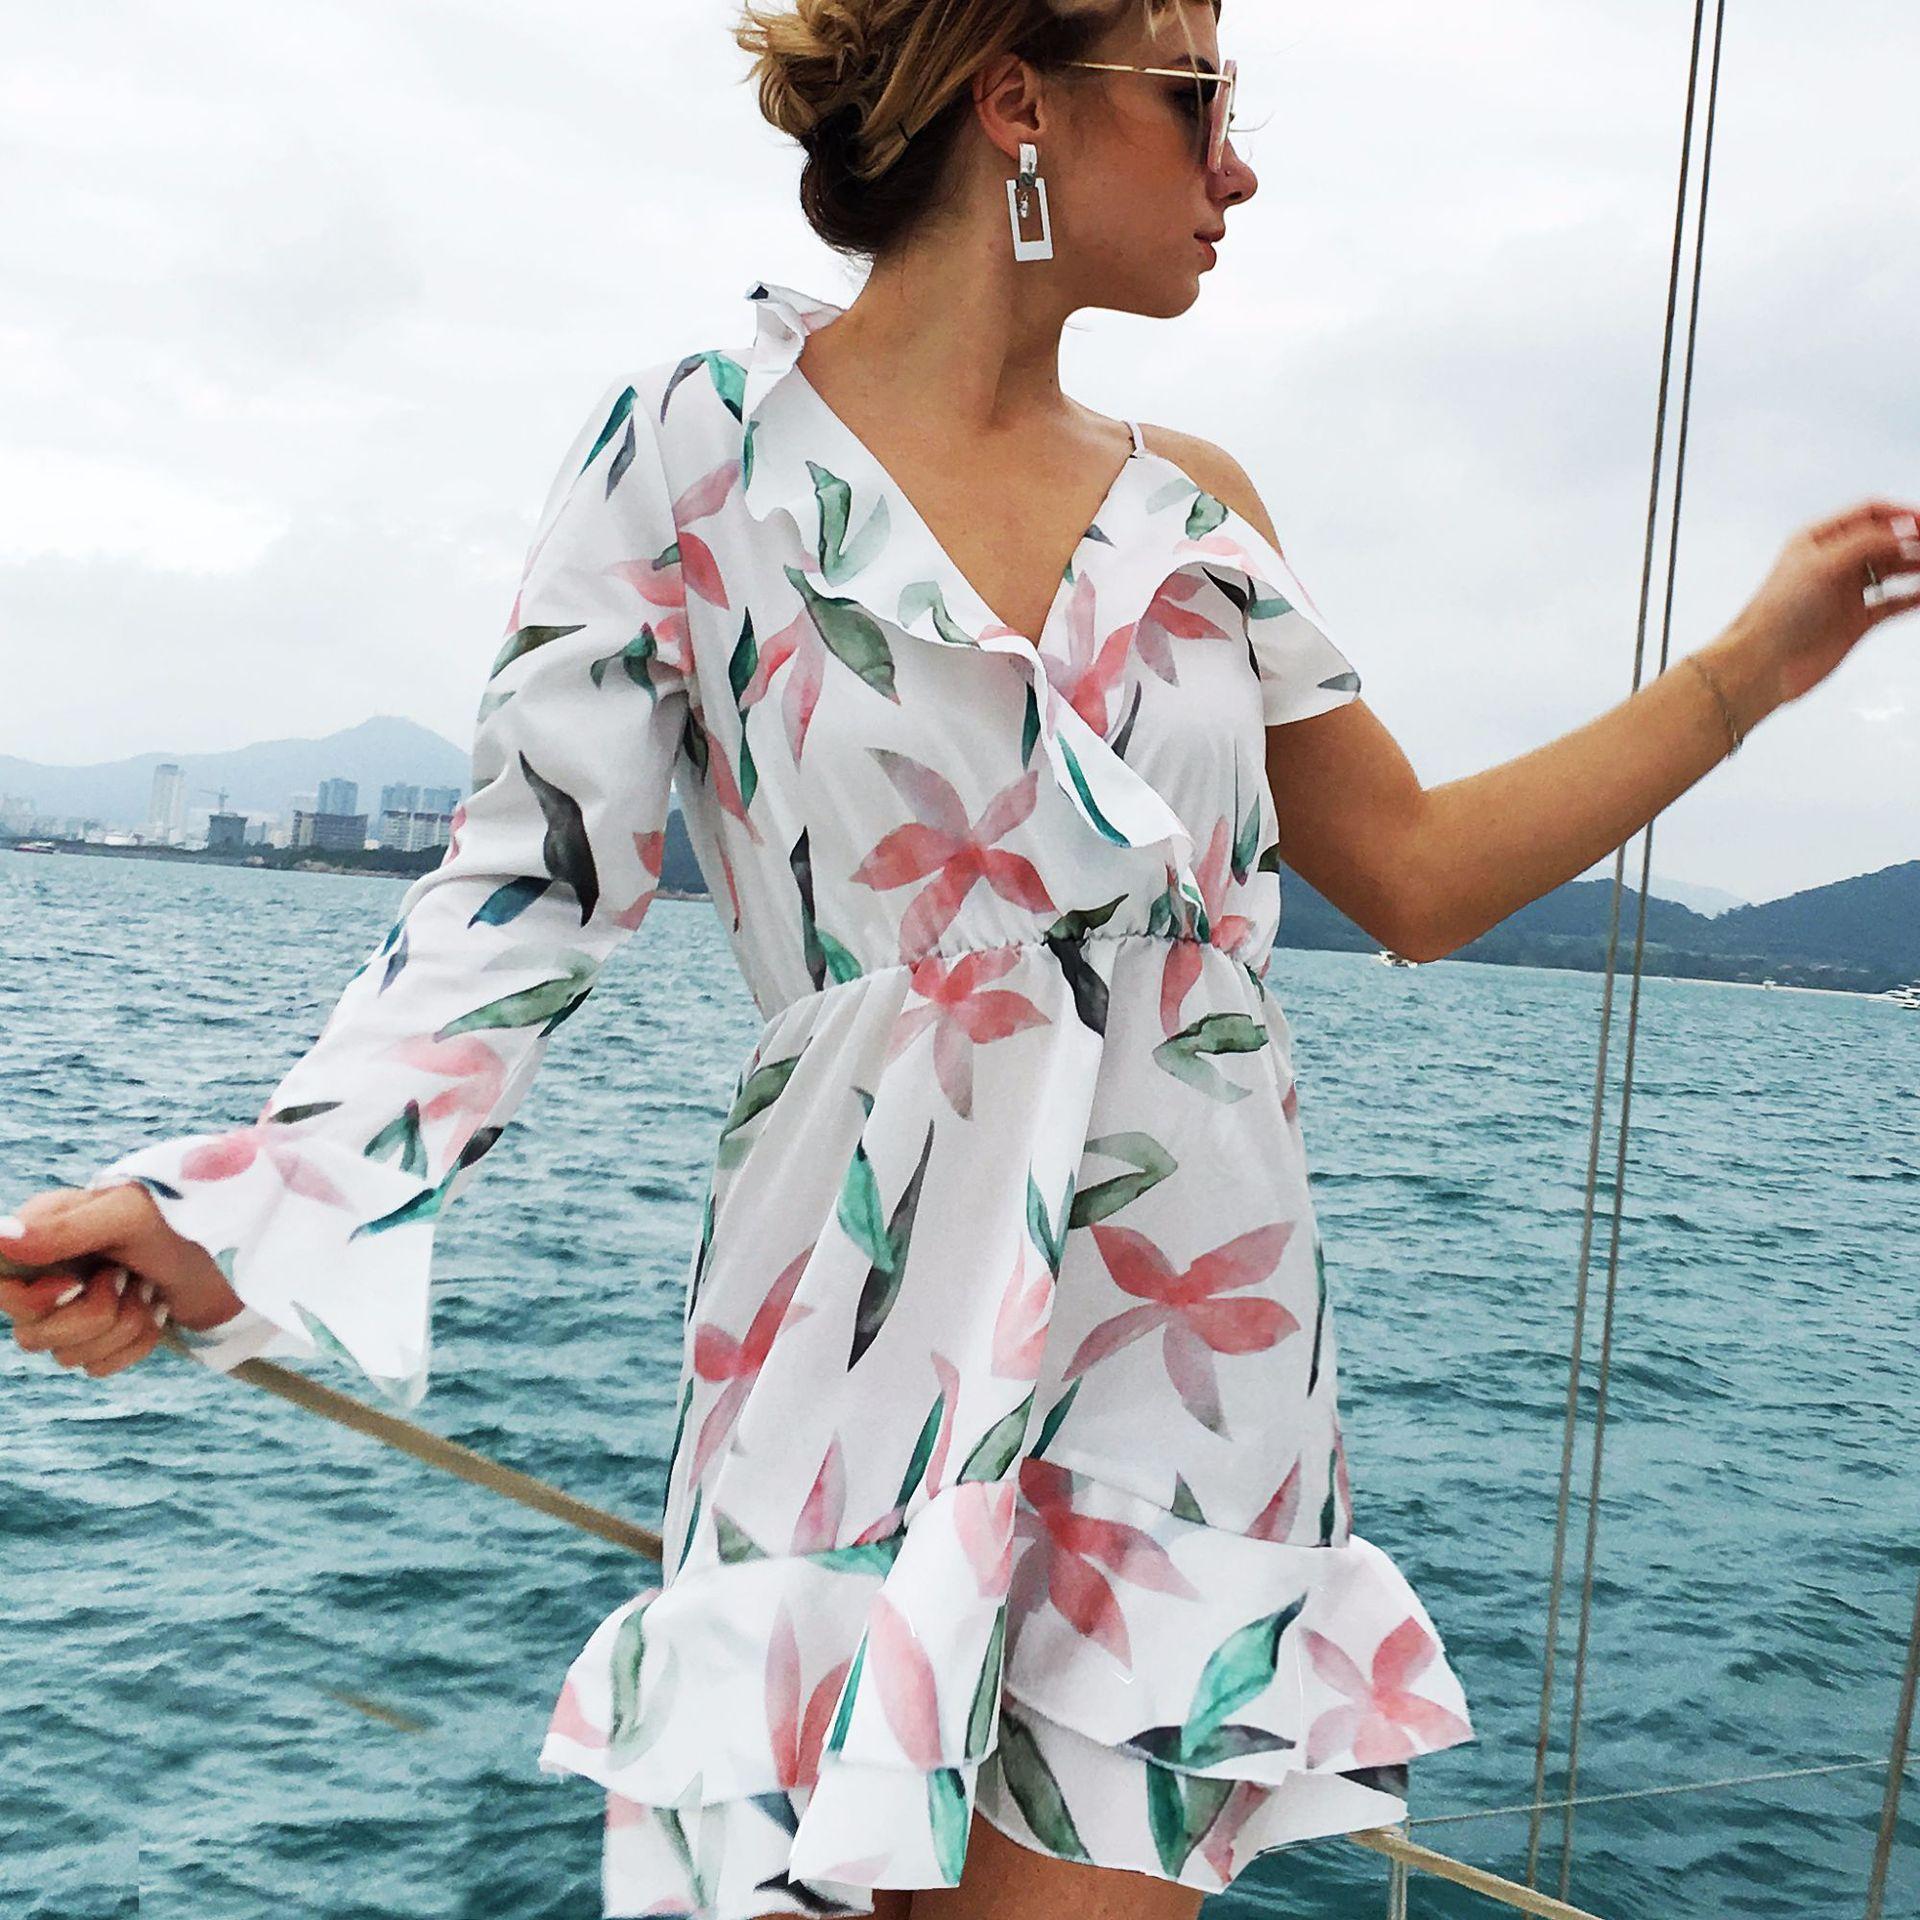 cfc4147596 Hot 2018 Women Sexy Chiffon Bikini Cover Up Beach Swimwear Dress Scarf  Pareo Sarong Wrap Ladies Summer Dress